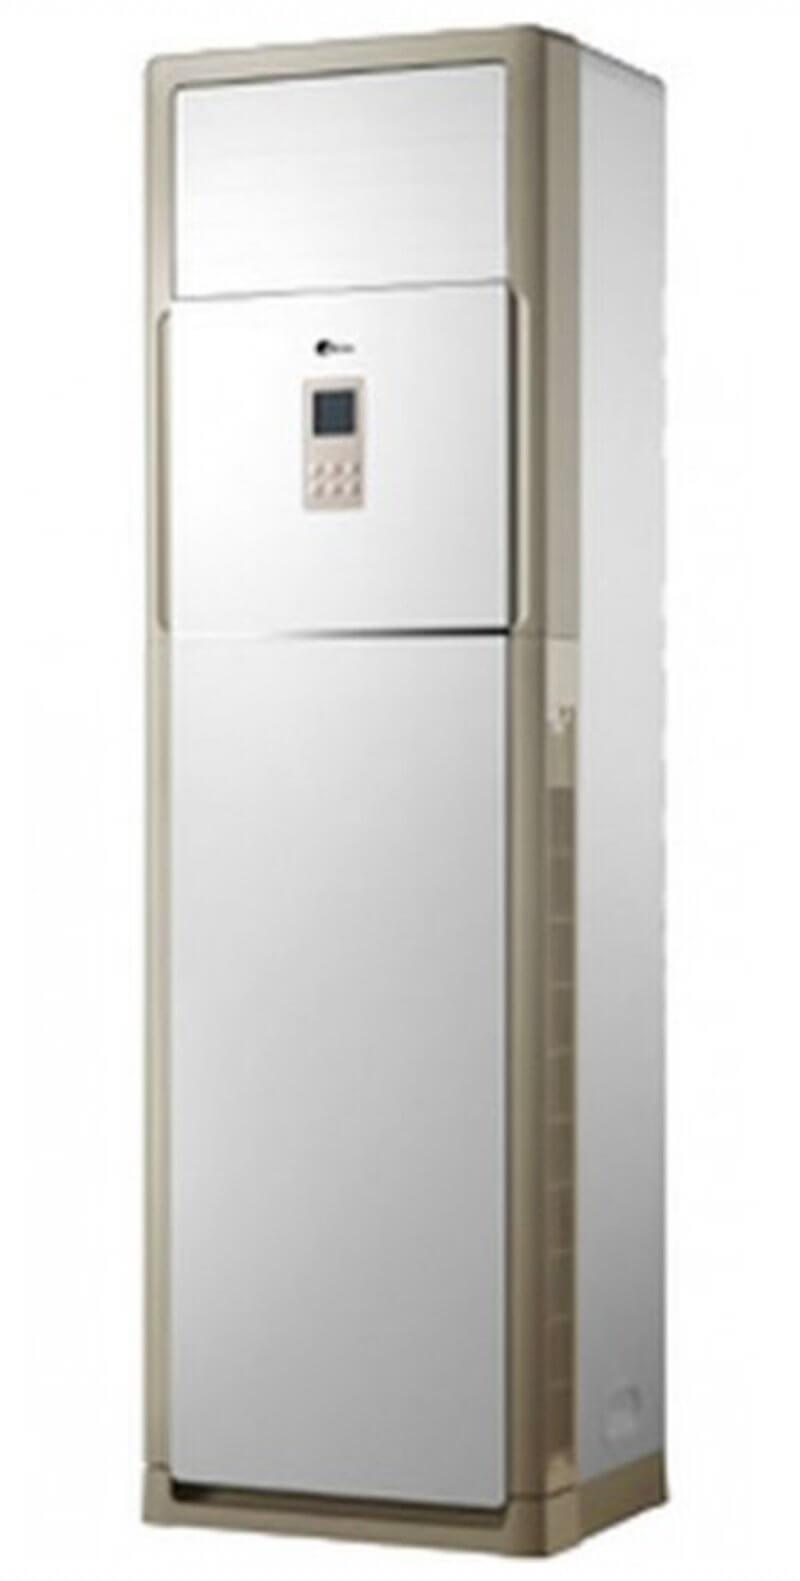 Midea MHG-60 DCI İnverter Salon Tipi Klima